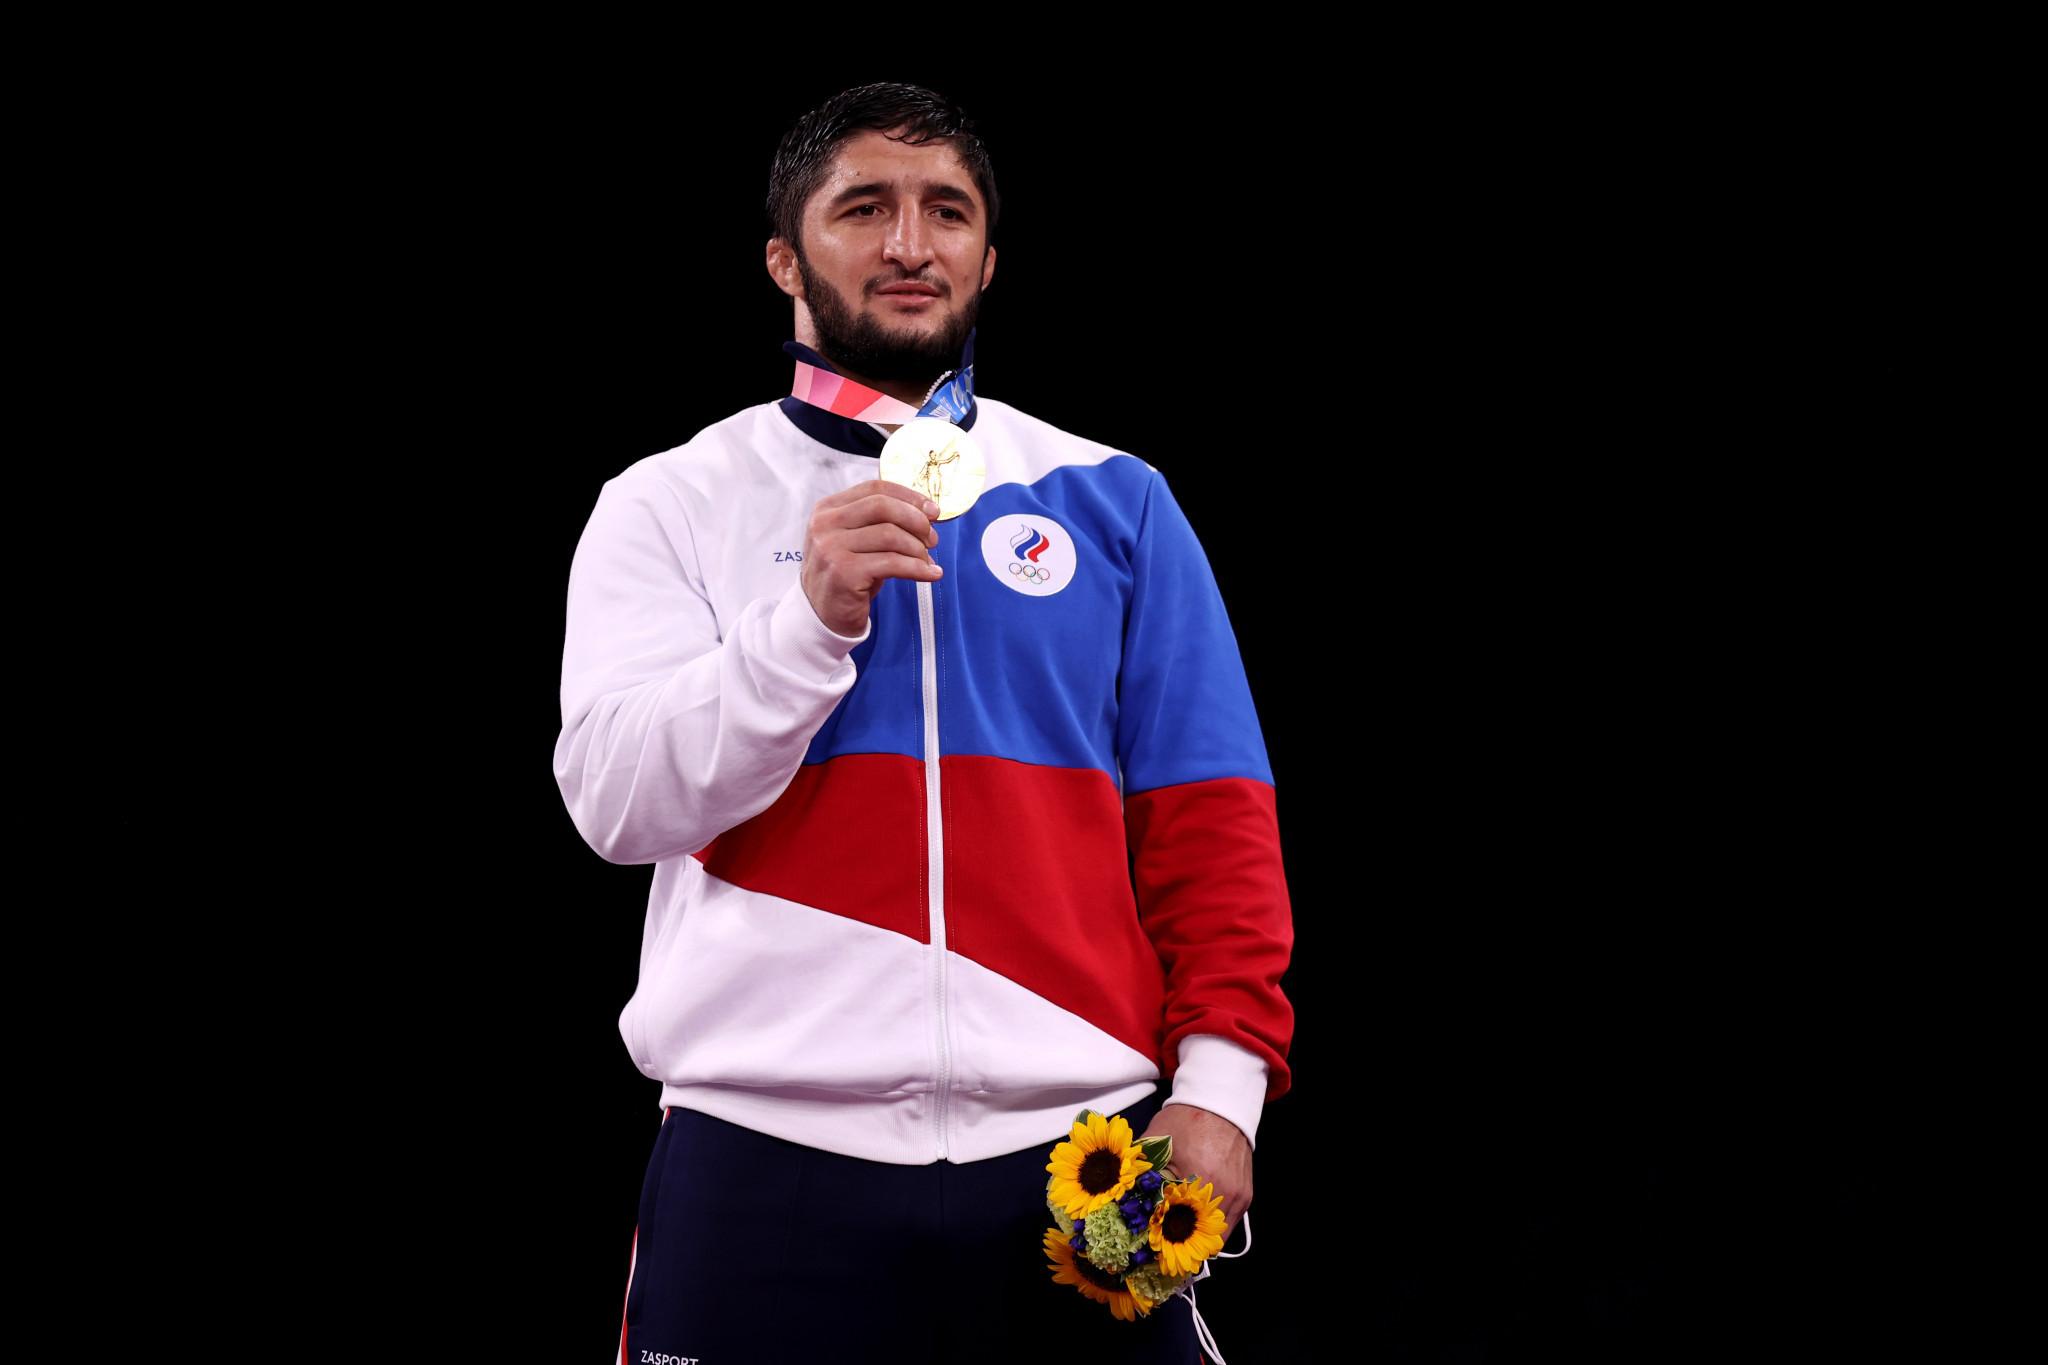 Four-time world champion Sadulaev among 25 Tokyo 2020 medallists involved at UWW World Championships in Oslo